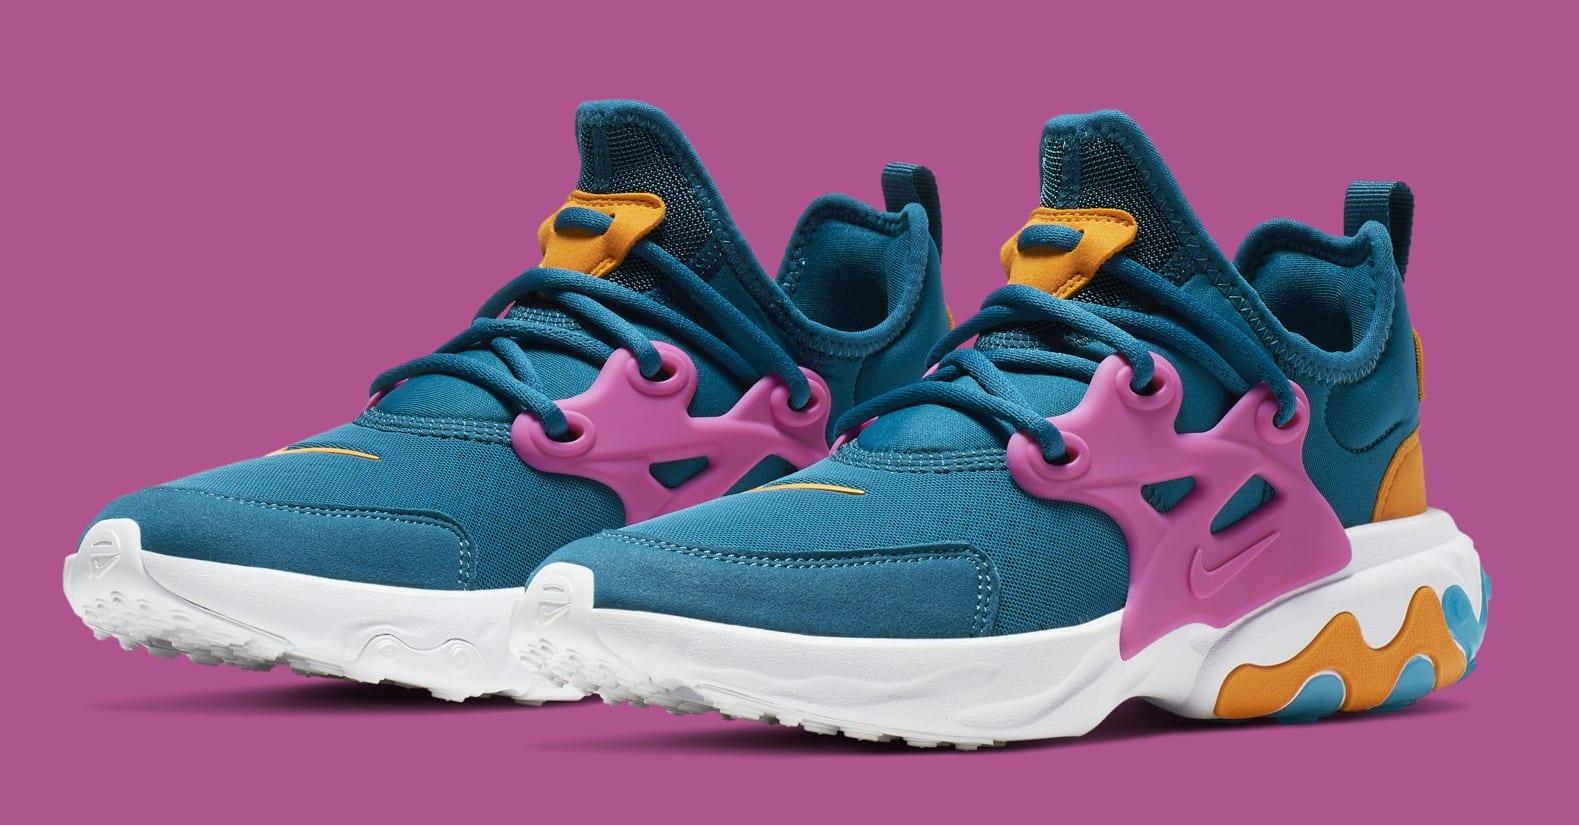 Nike Presto React BQ4002-300 (Pair)